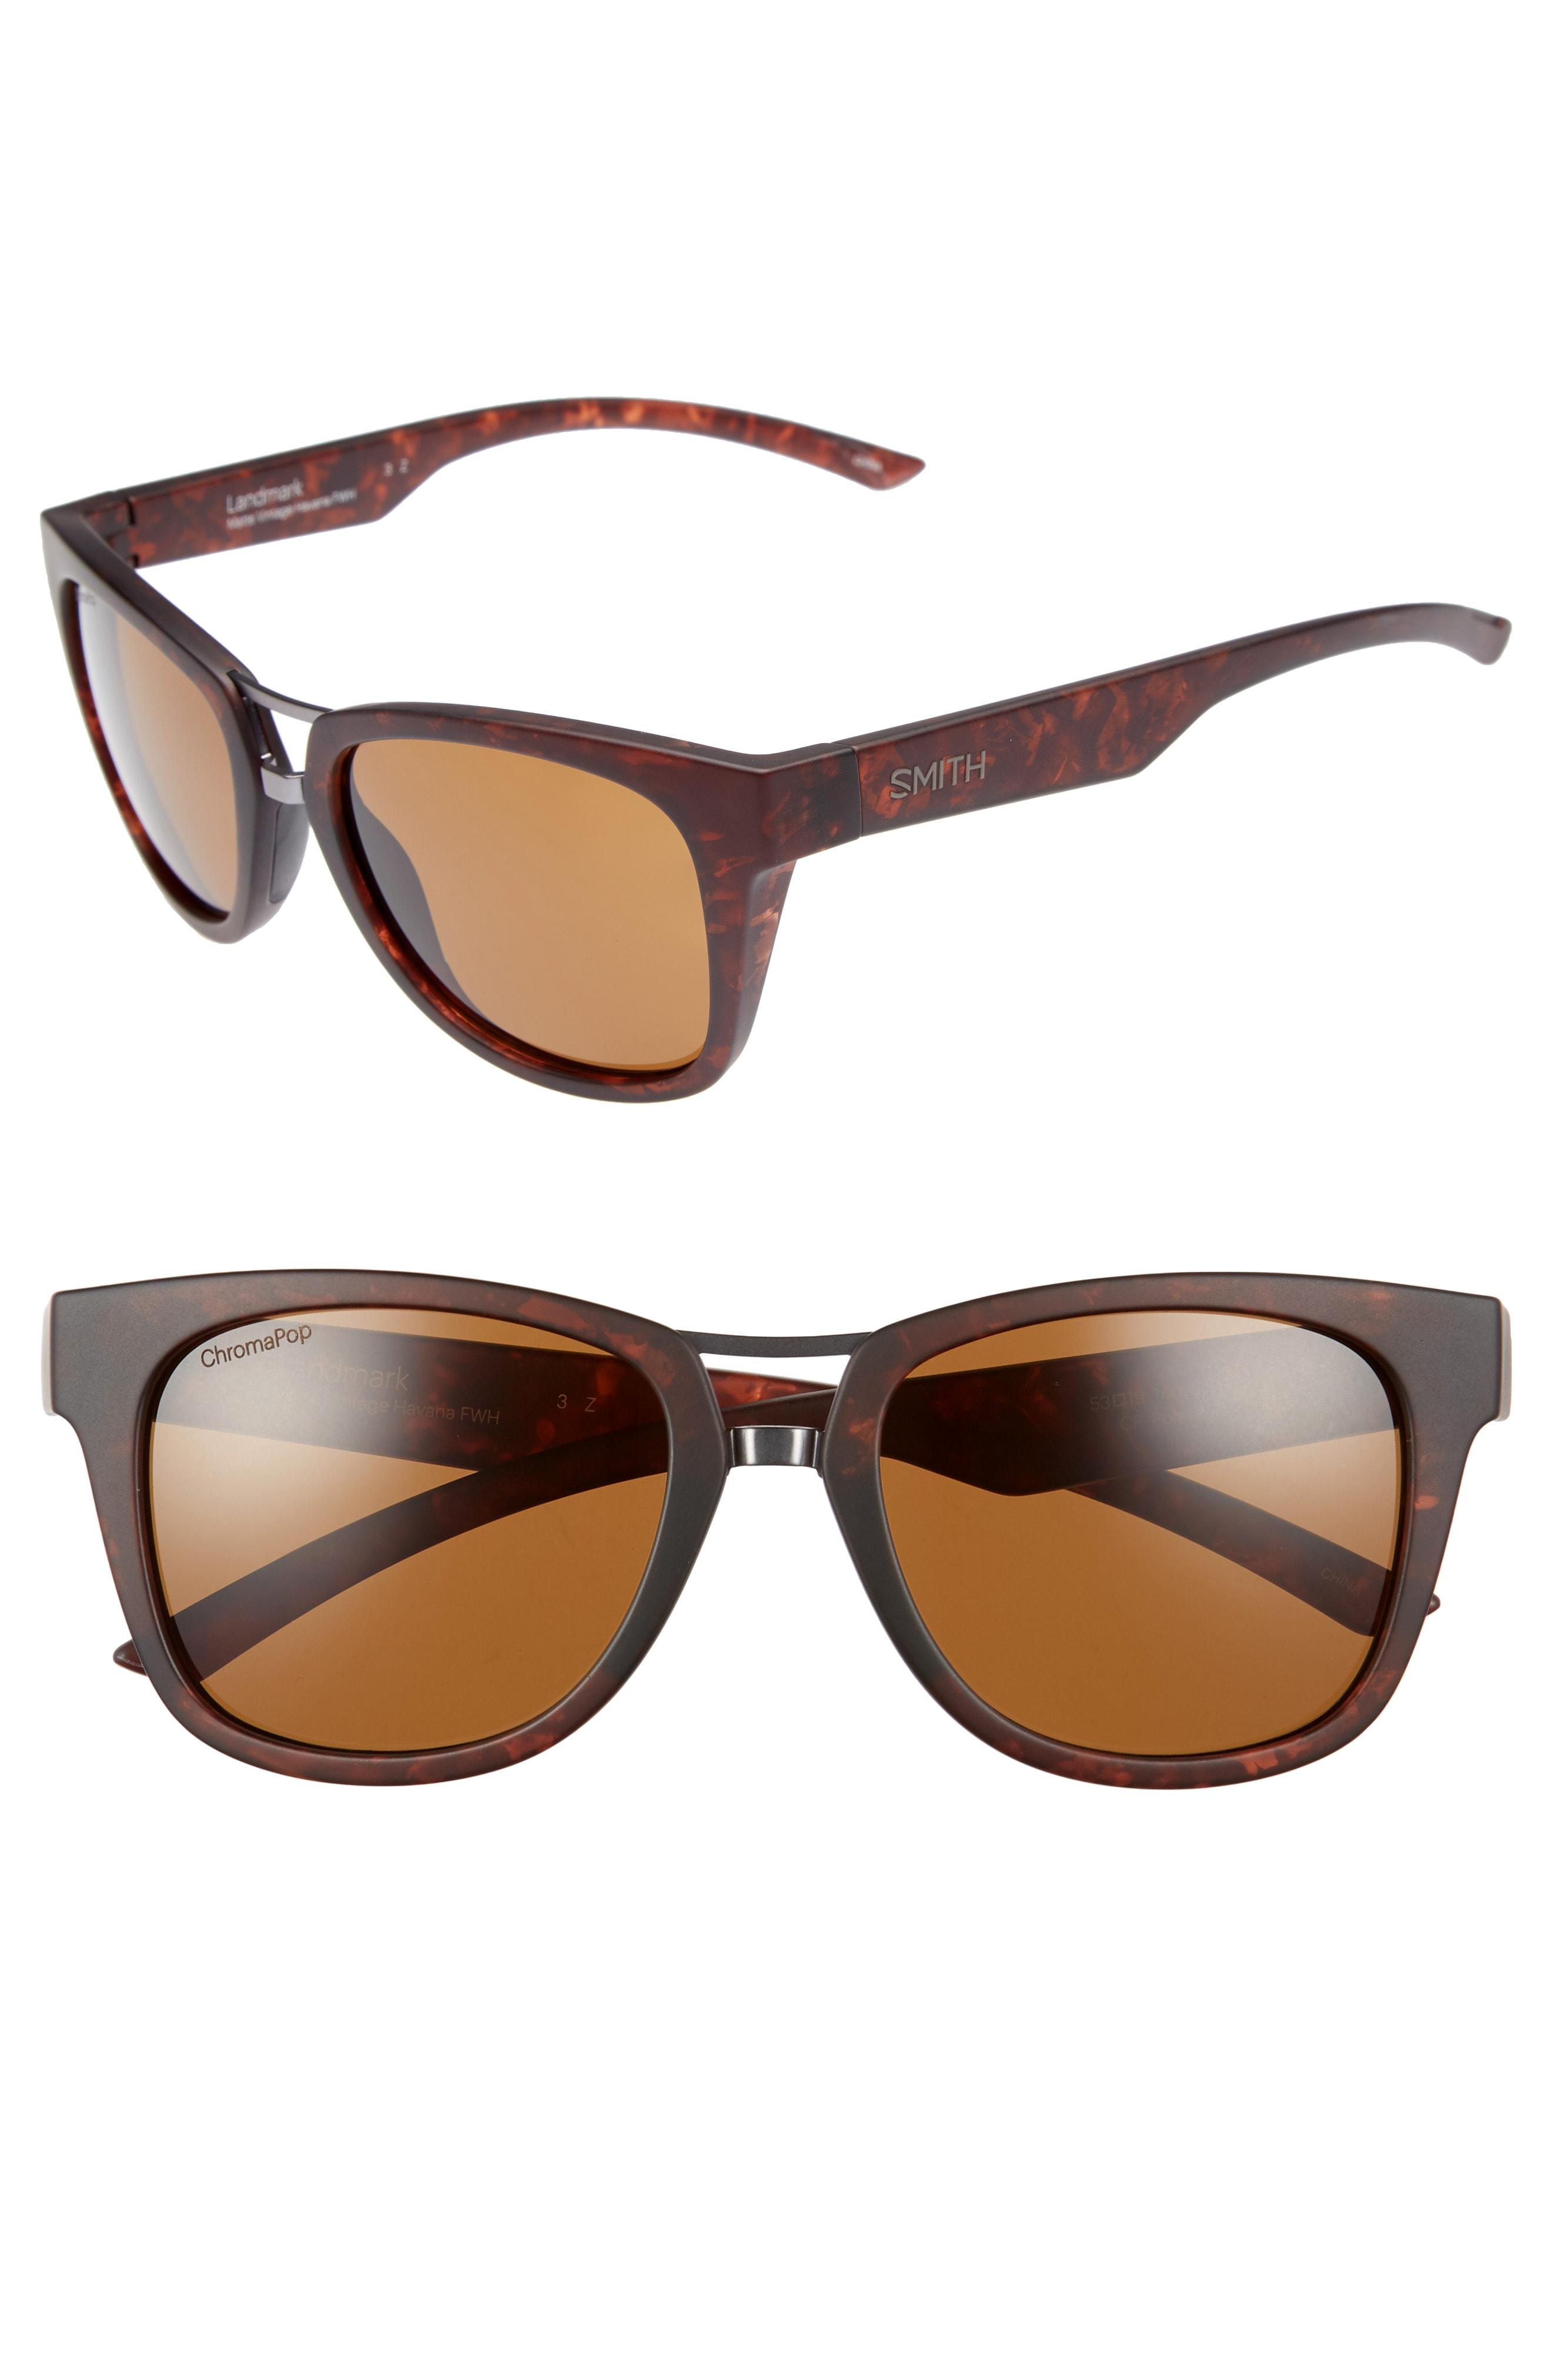 Smith Landmark 53mm ChromaPop Polarized Sunglasses